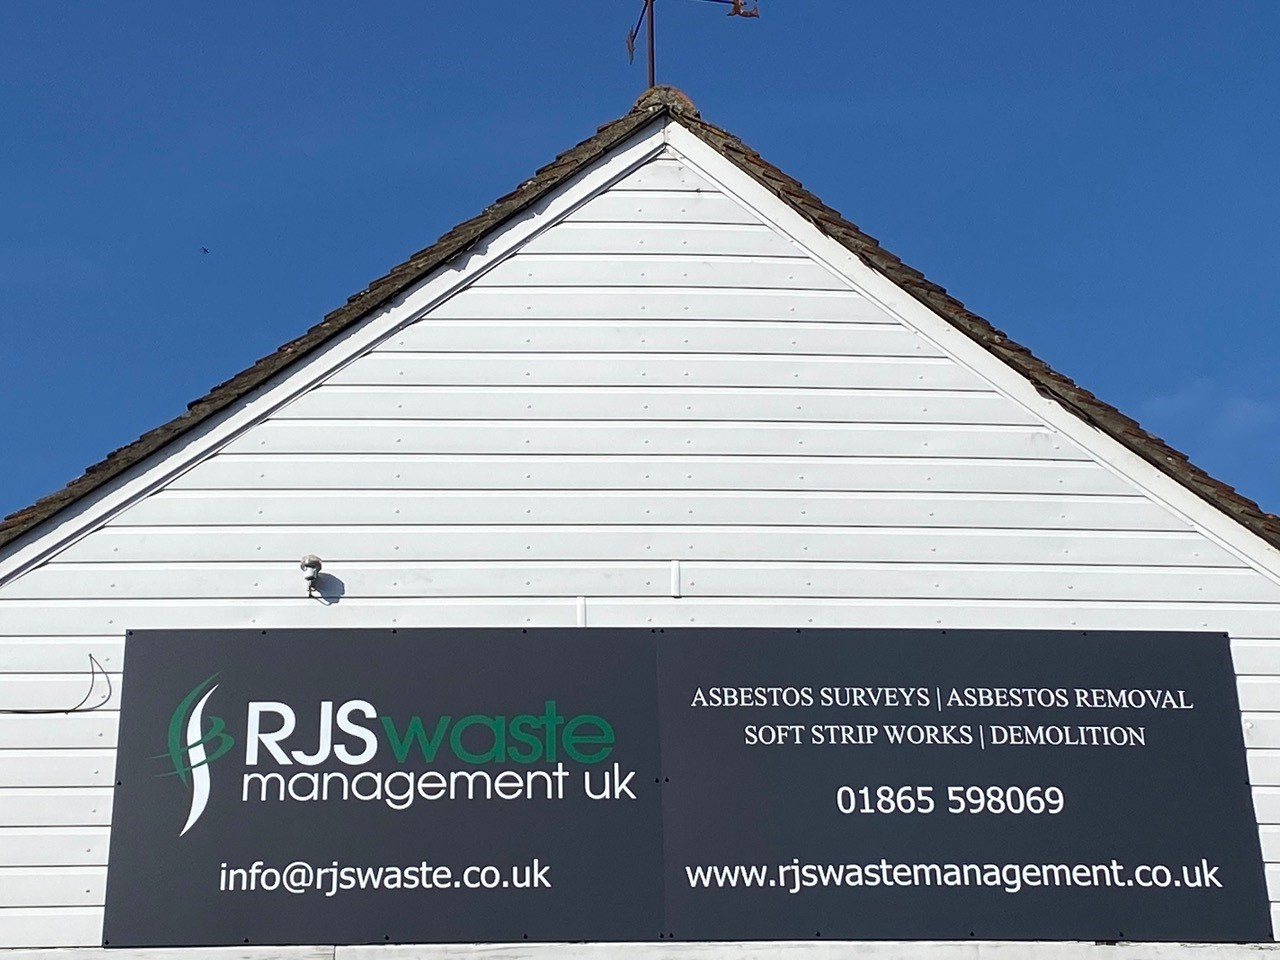 RJS Waste Management Oxford office